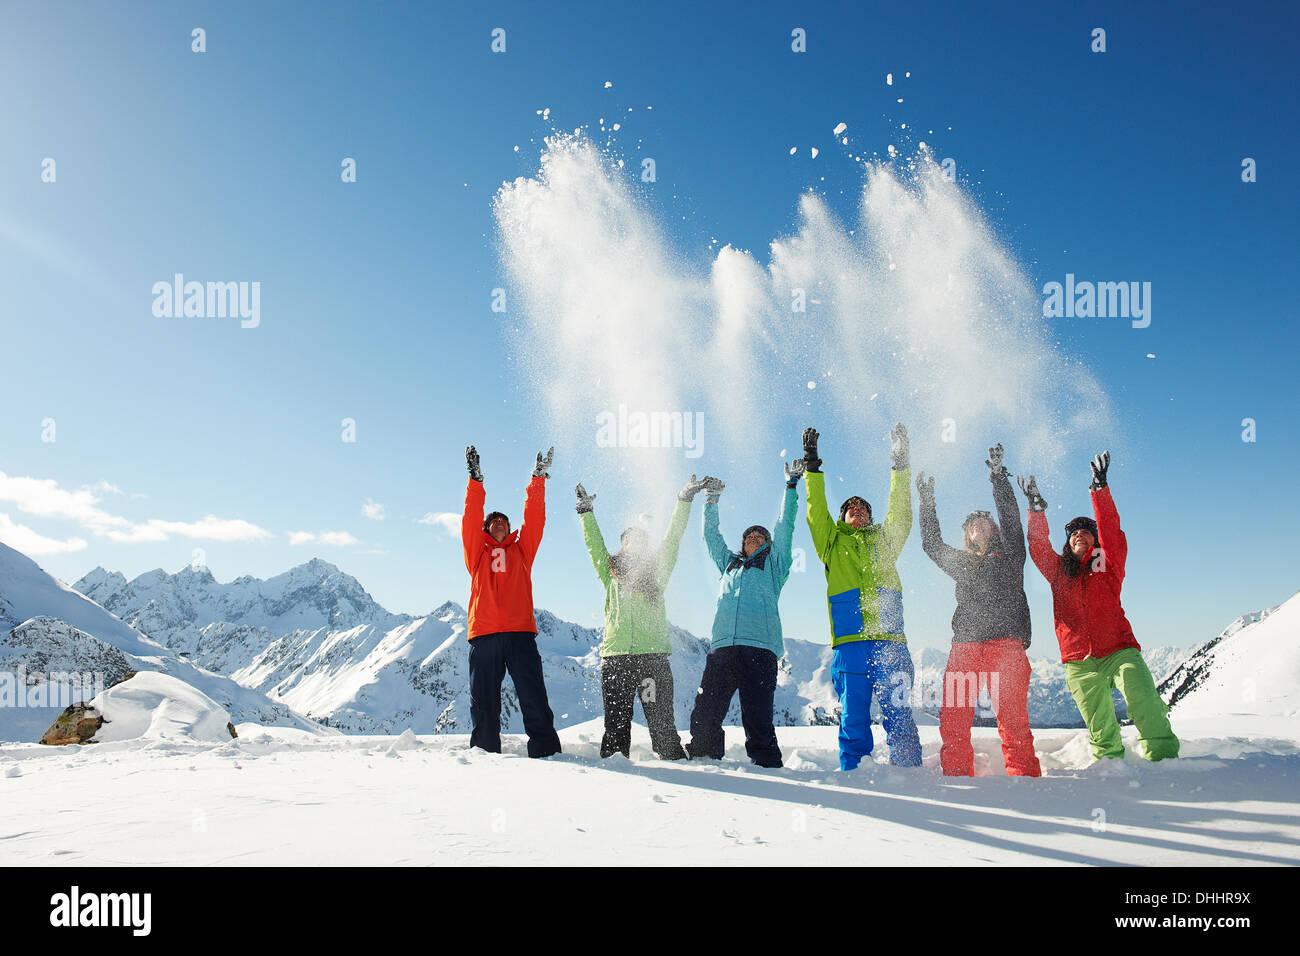 Friends throwing snow mid-air, Kuhtai, Austria - Stock Image